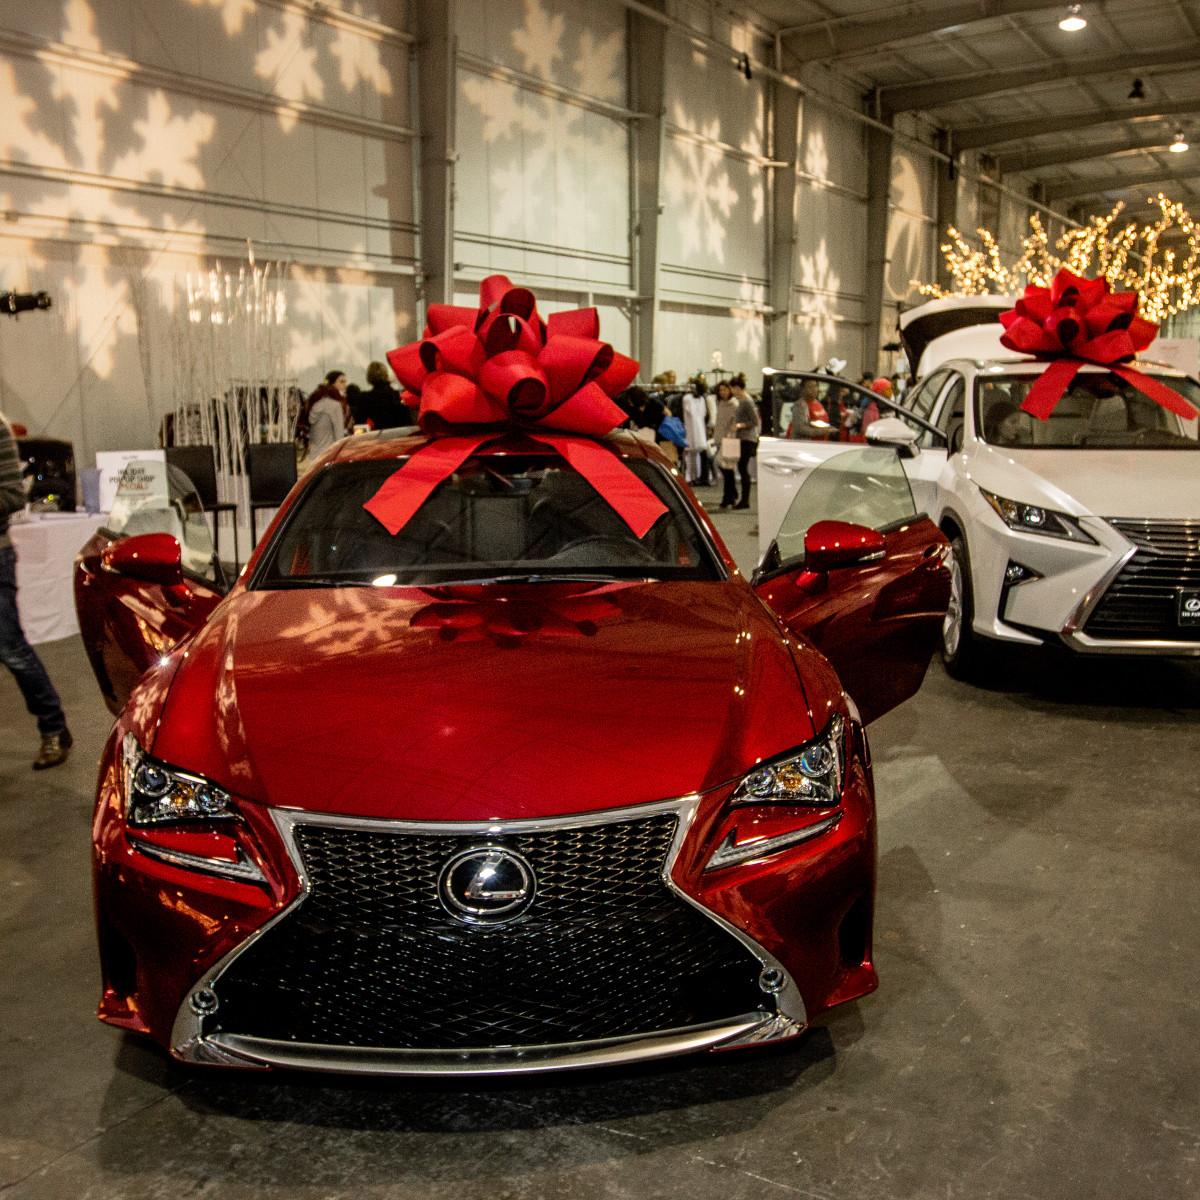 News, CM Holiday Pop-Up Shop, Dec. 2015, Lexus